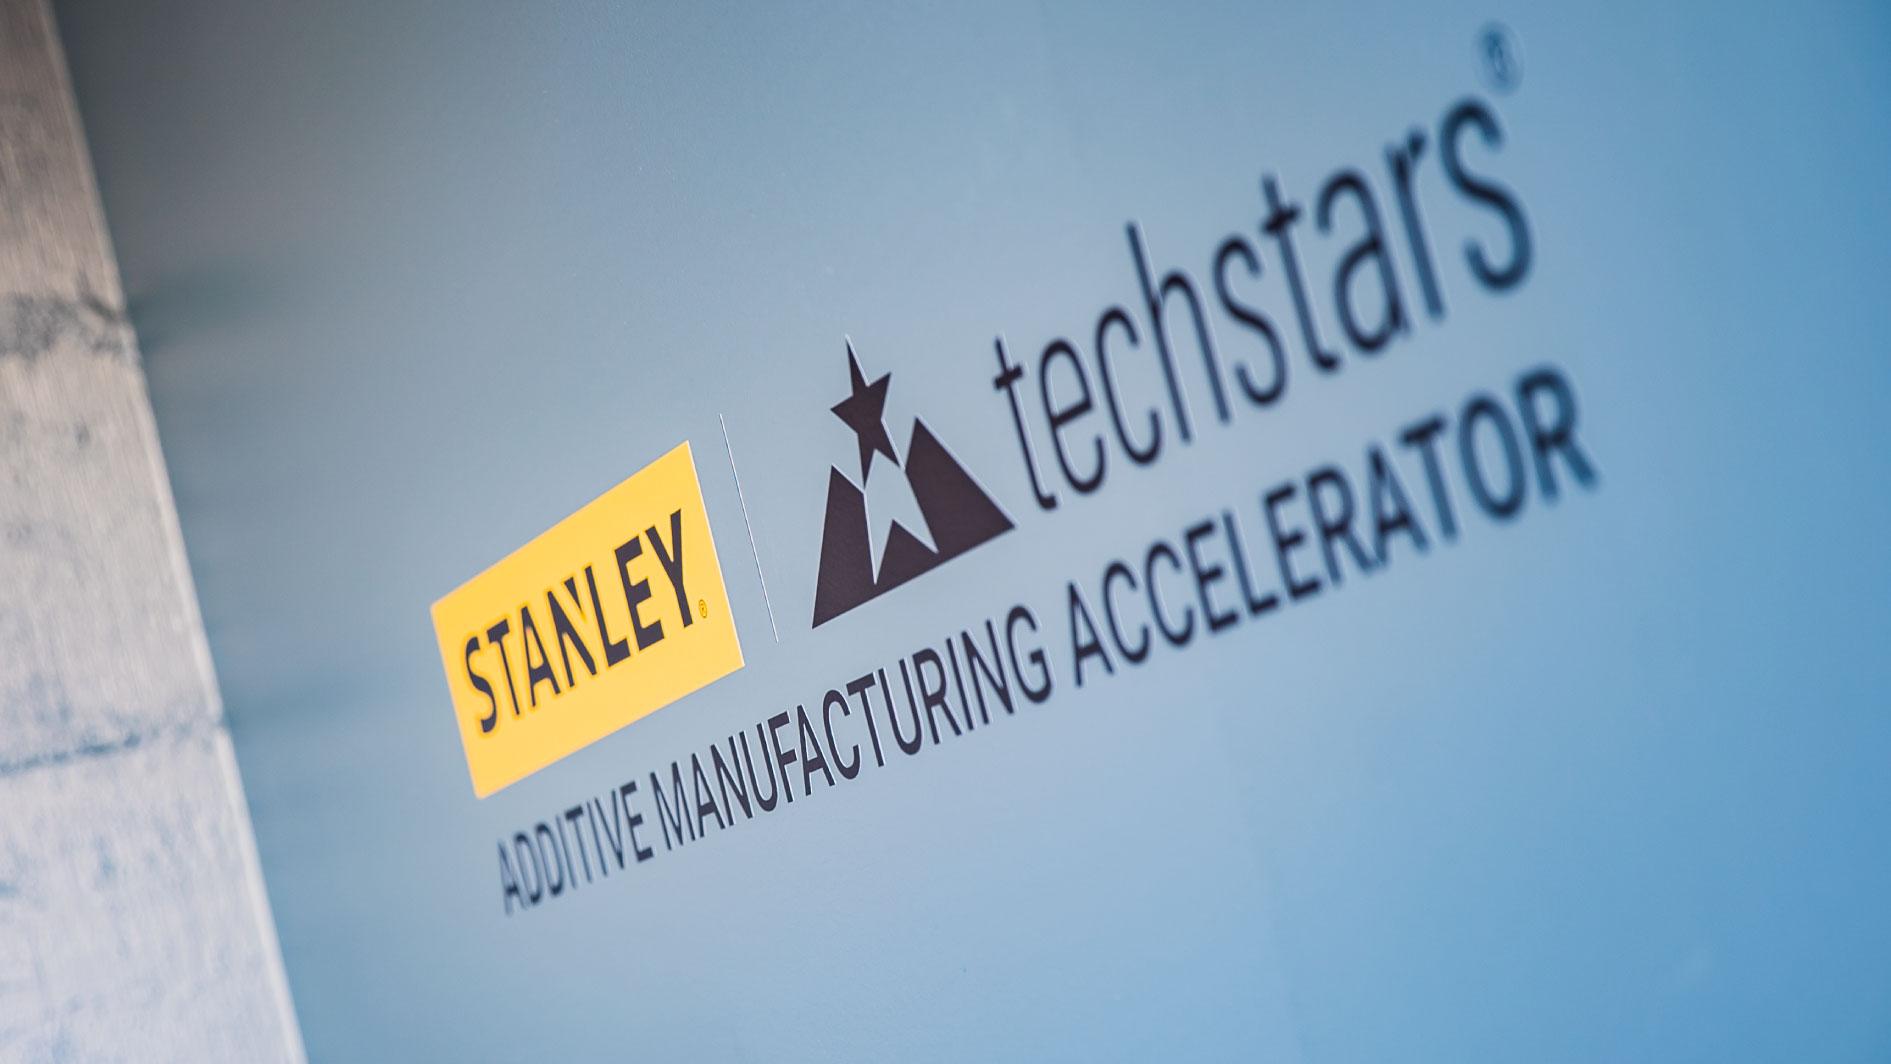 The STANLEY+Techstars Accelerator logo. Photo via Stanley Black & Decker.